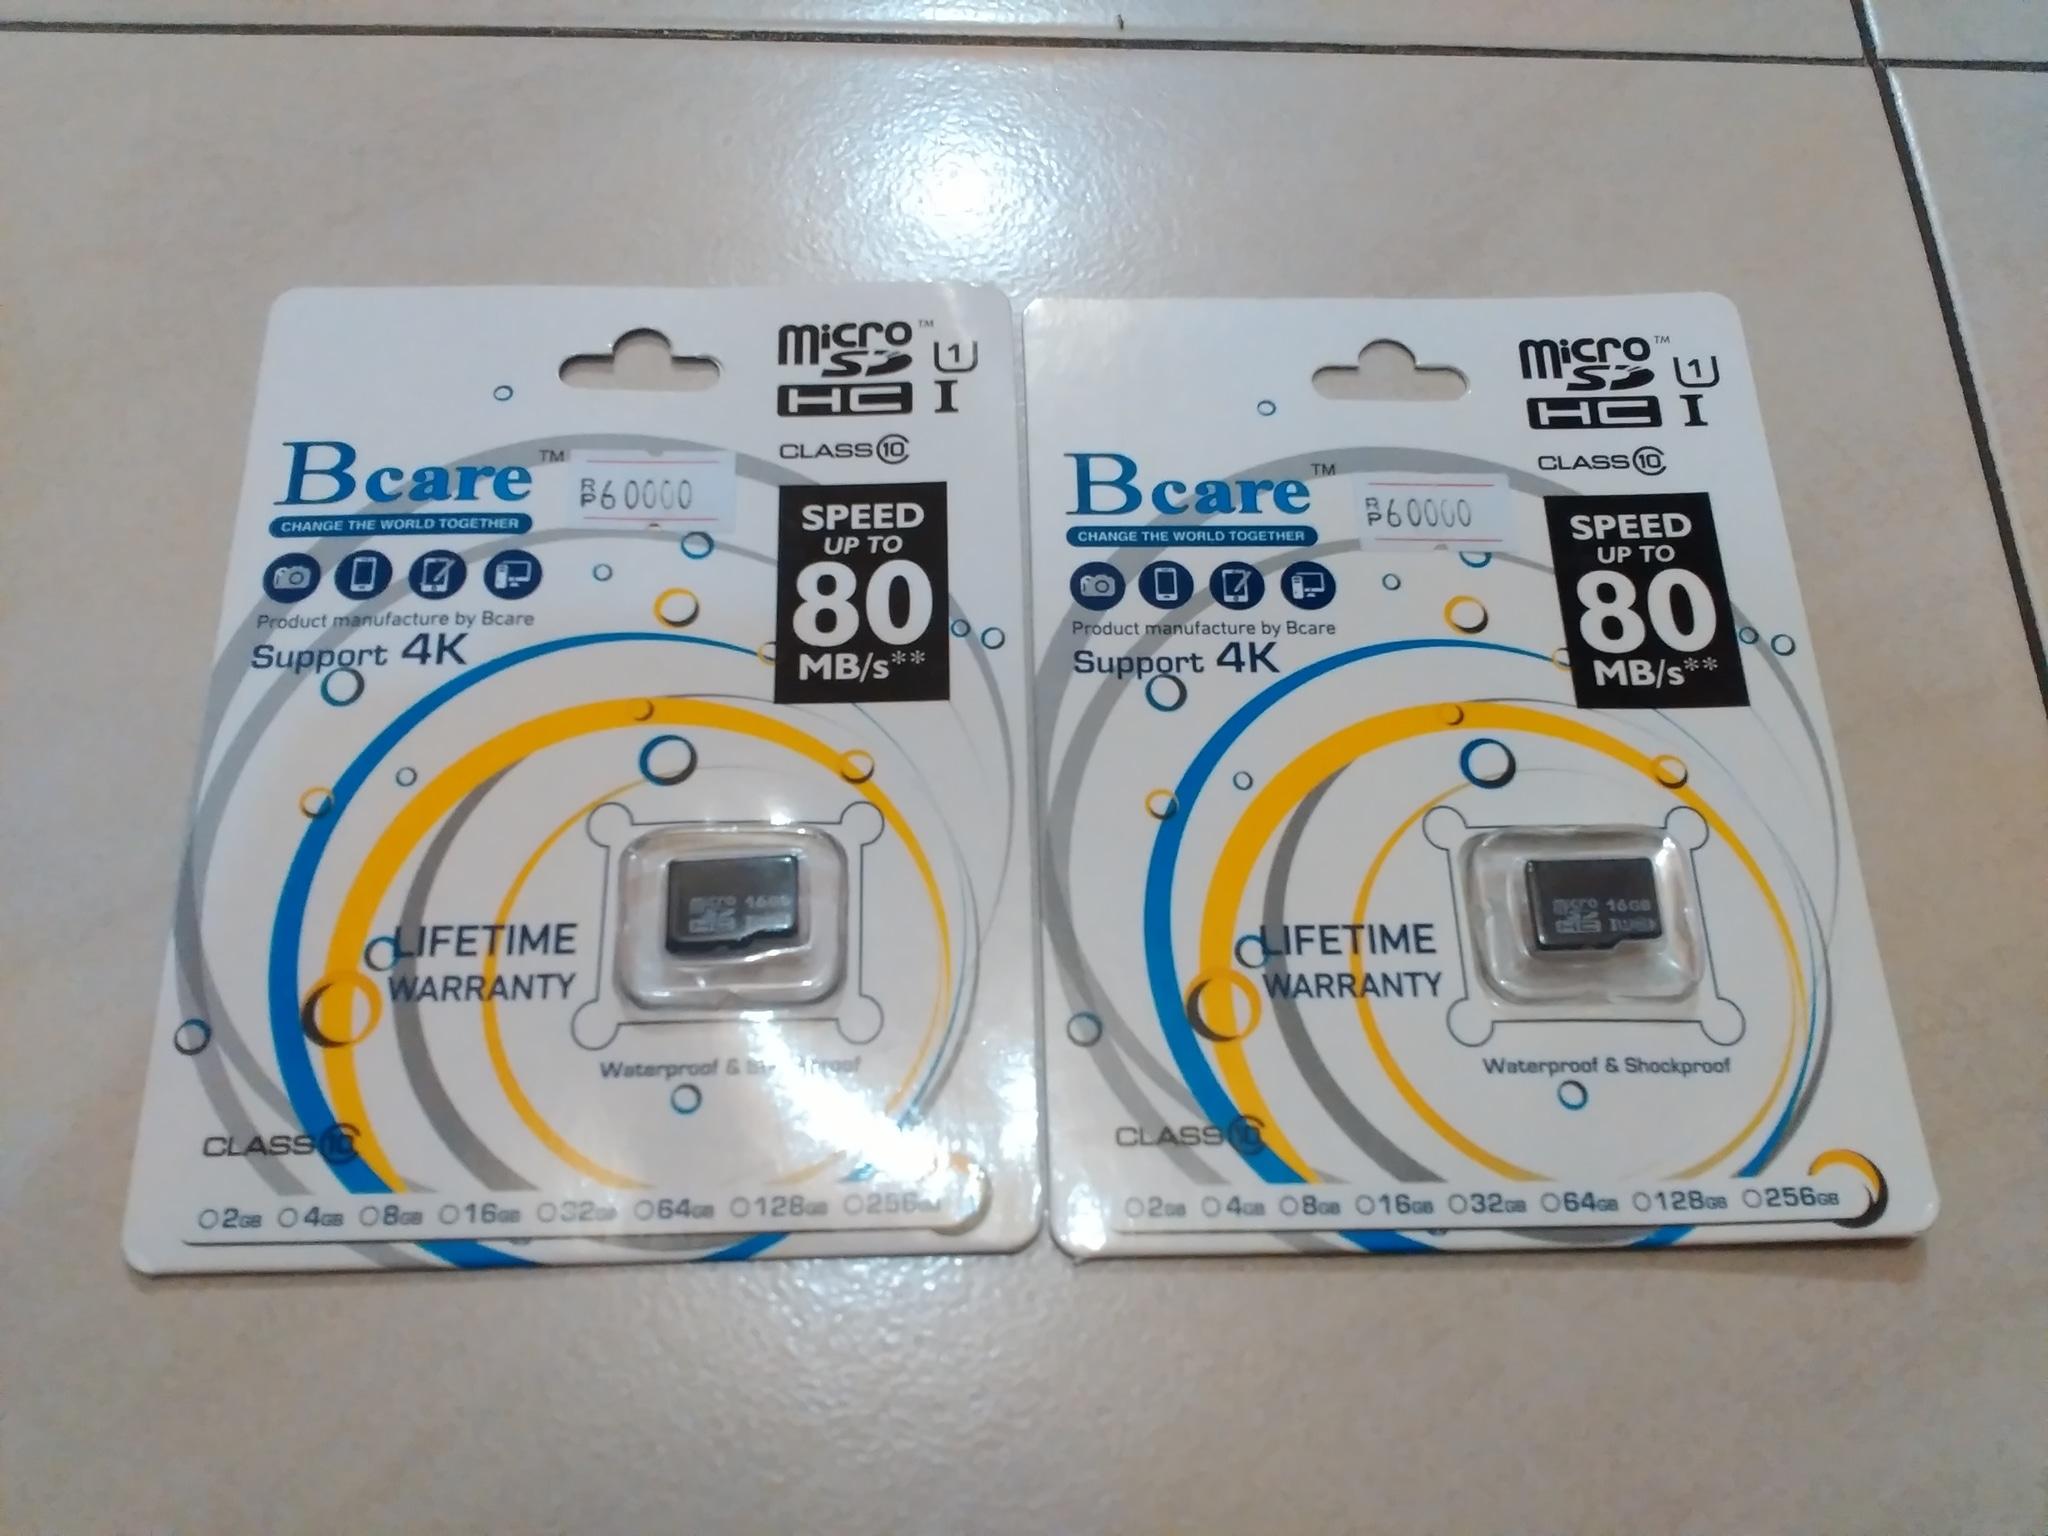 Jual Micro Sd Bcare 16gb Class 10 Speed Up To 80 Mbps Jdorkcustom Flashdisk Tokopedia